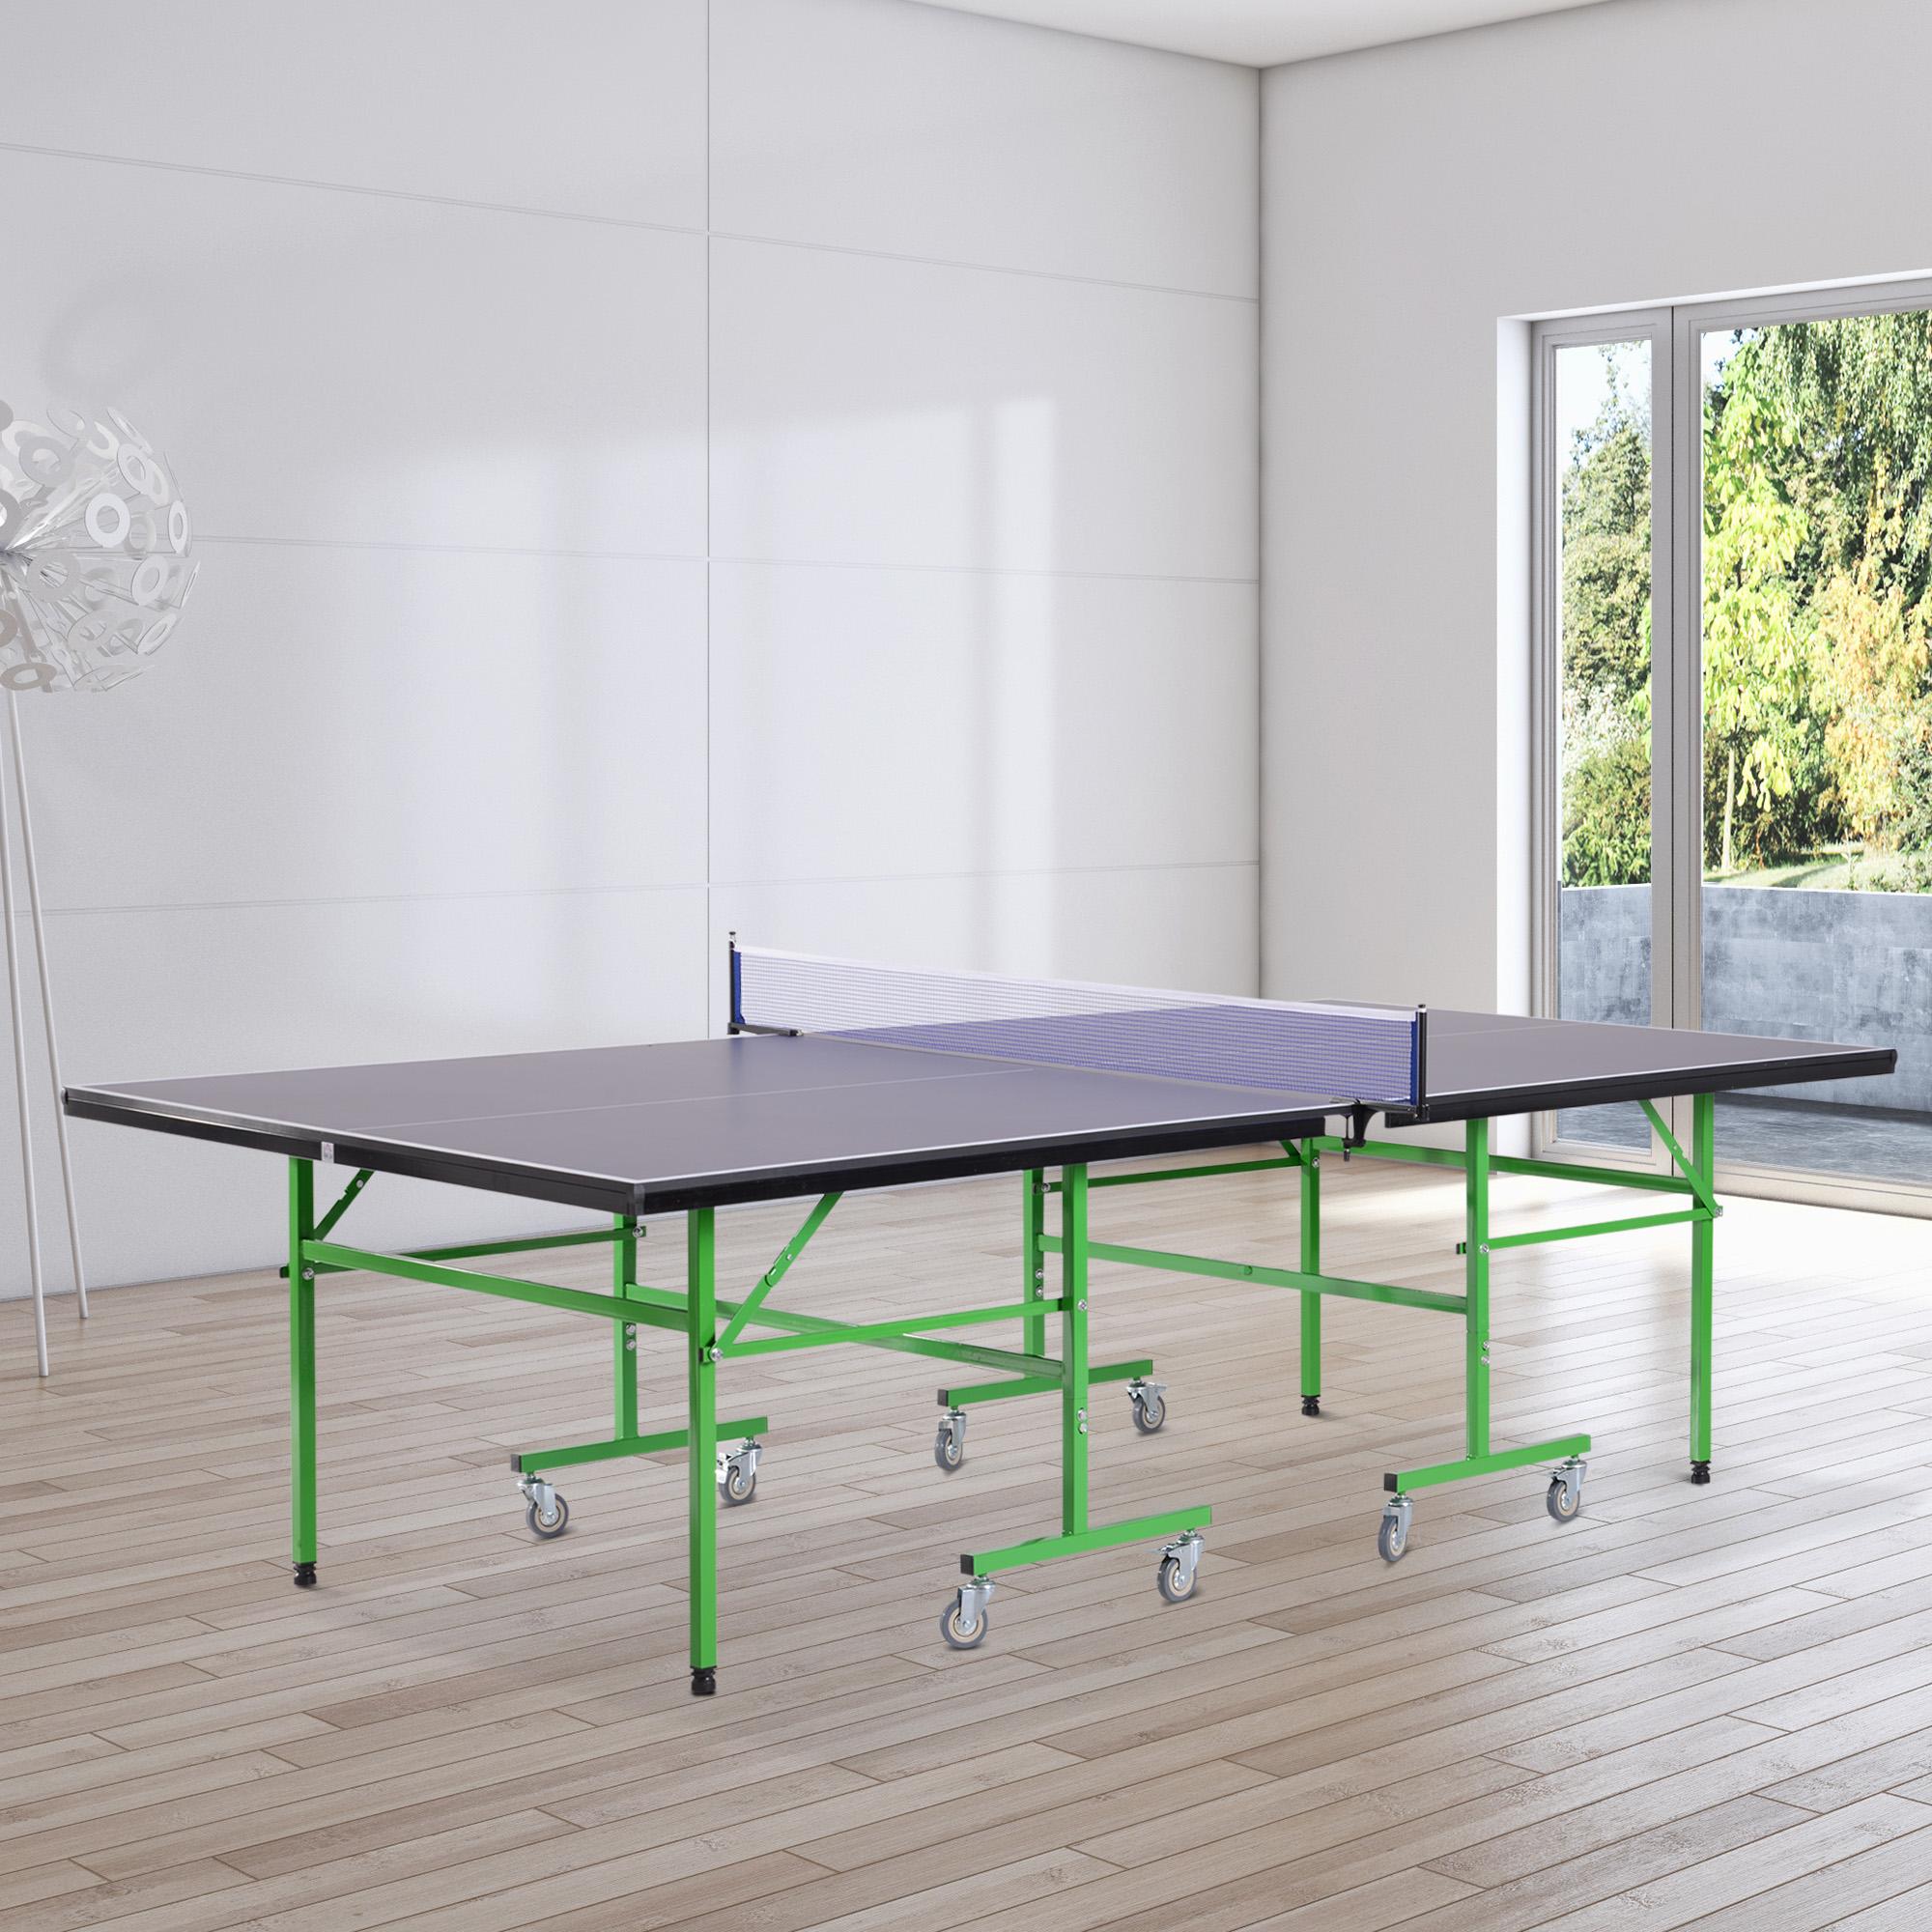 HOMCOM Tavolo da Ping Pong Professionale Interno Esterno ...